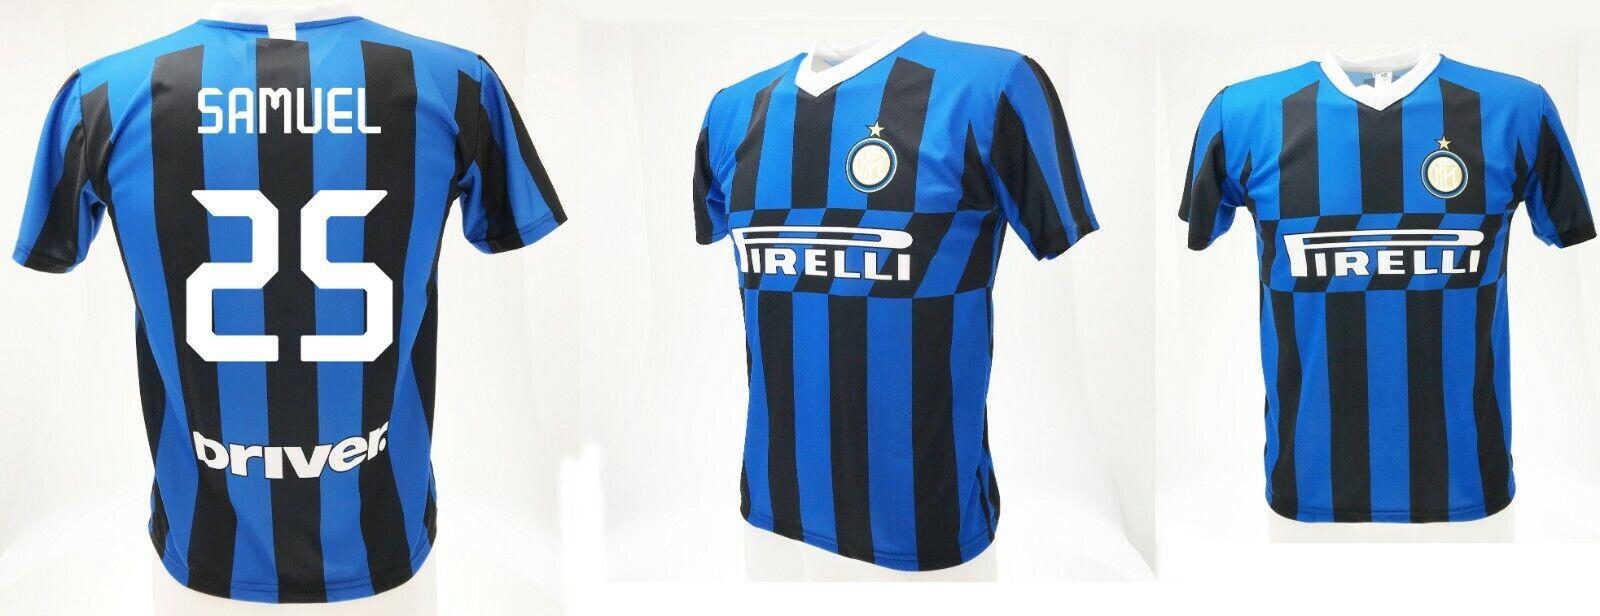 Camiseta Samuel Inter  2020 Producto Oficial Uniforme Oficial 2019 Teórica 25  costo real